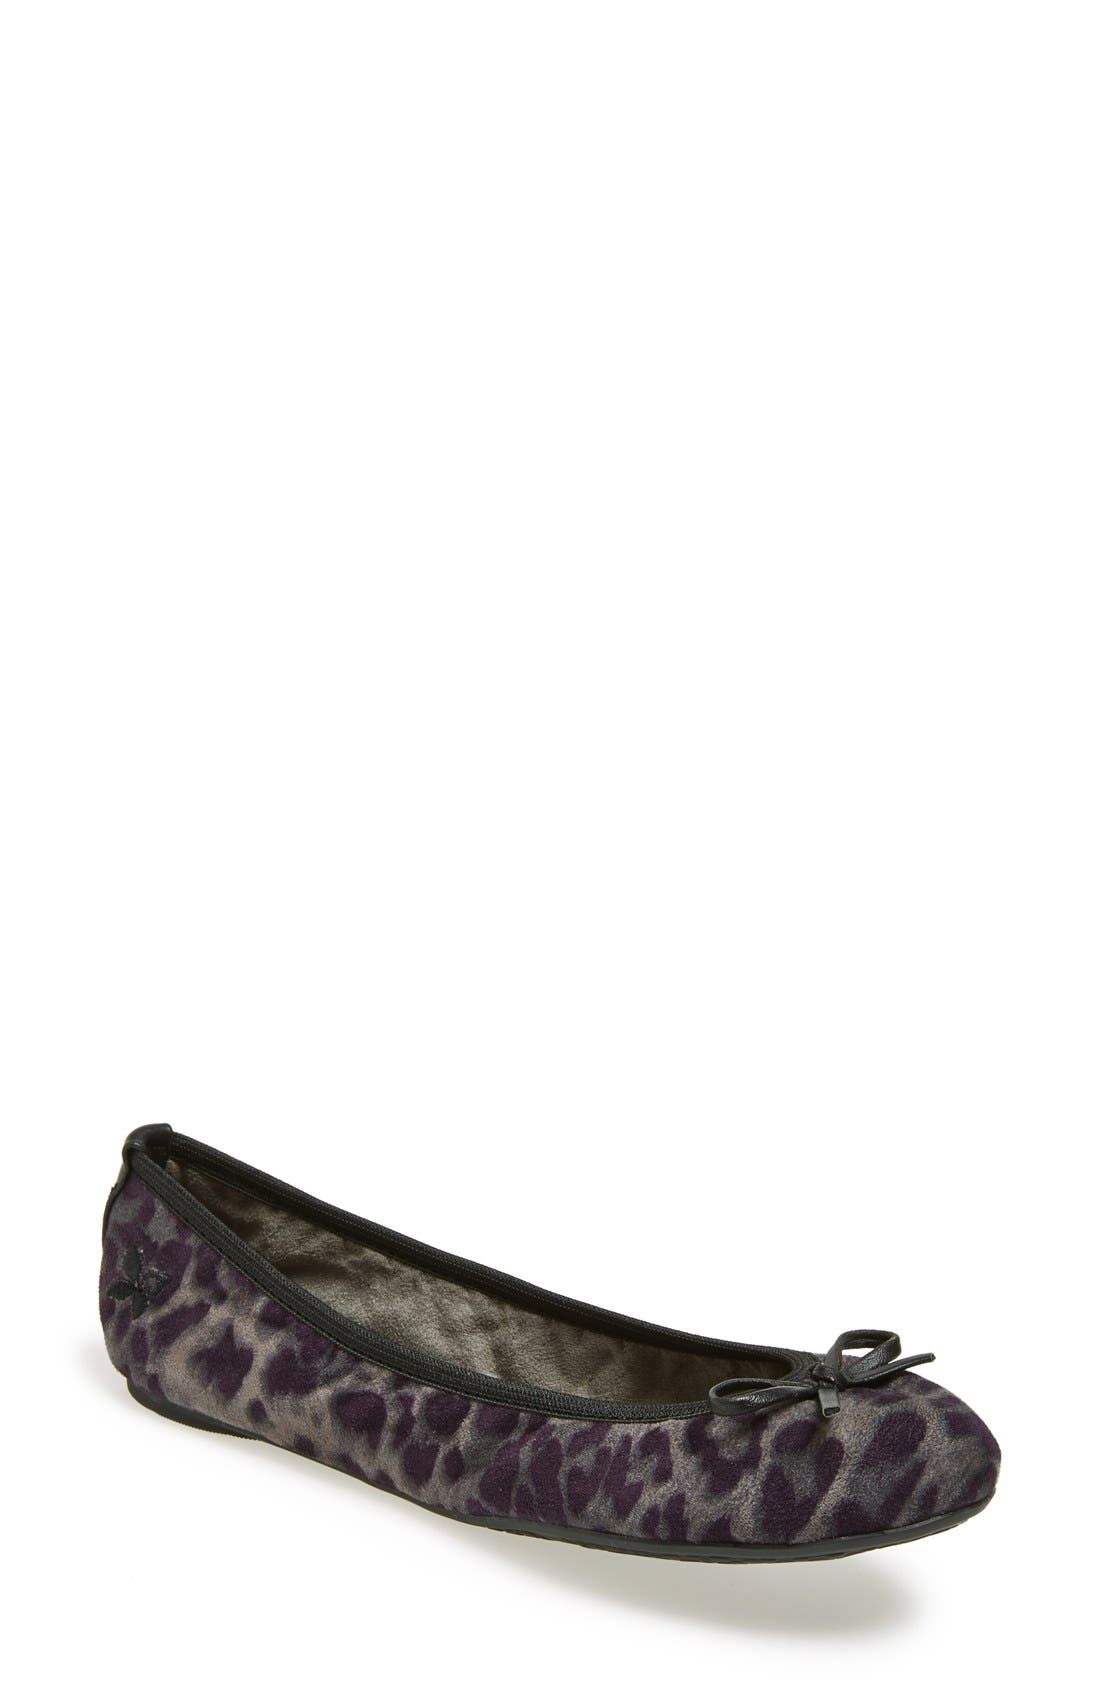 Alternate Image 1 Selected - Butterfly Twists 'Cleo Leopard' Foldable Ballerina Flat (Women)